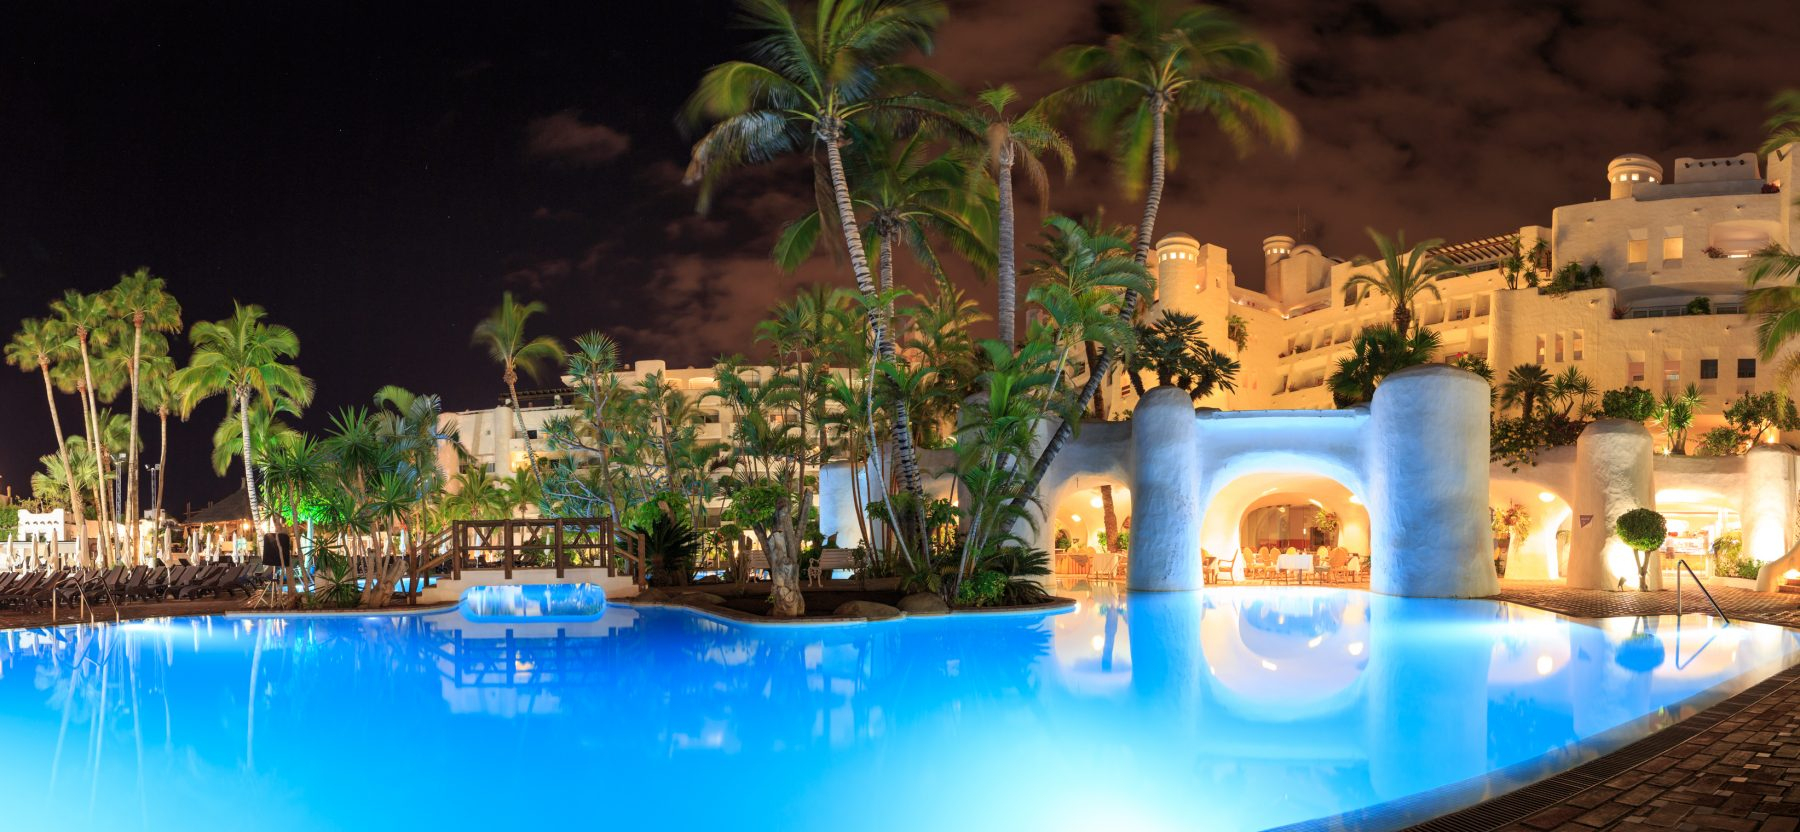 Jardín Tropical Hotel | My Way pour Jardin Tropical Tenerife